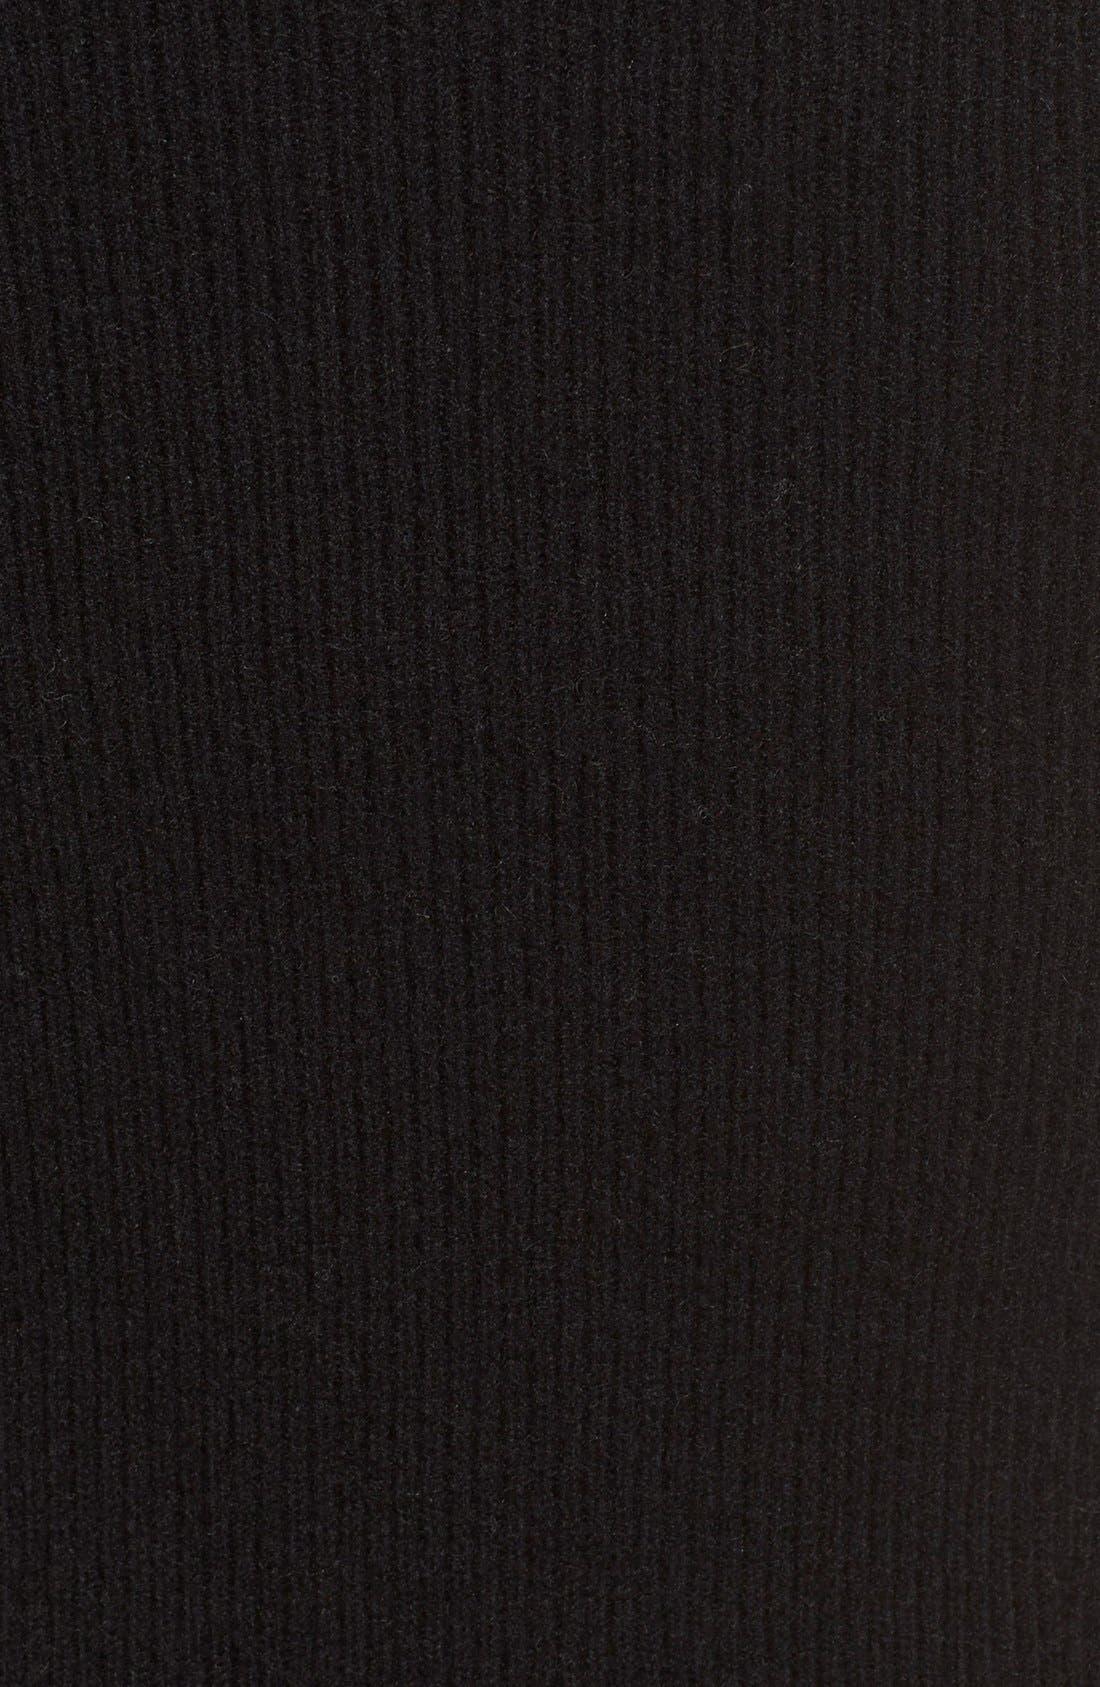 Donna KaranCollection MidweightCashmere Rib Tank Dress,                             Alternate thumbnail 6, color,                             001